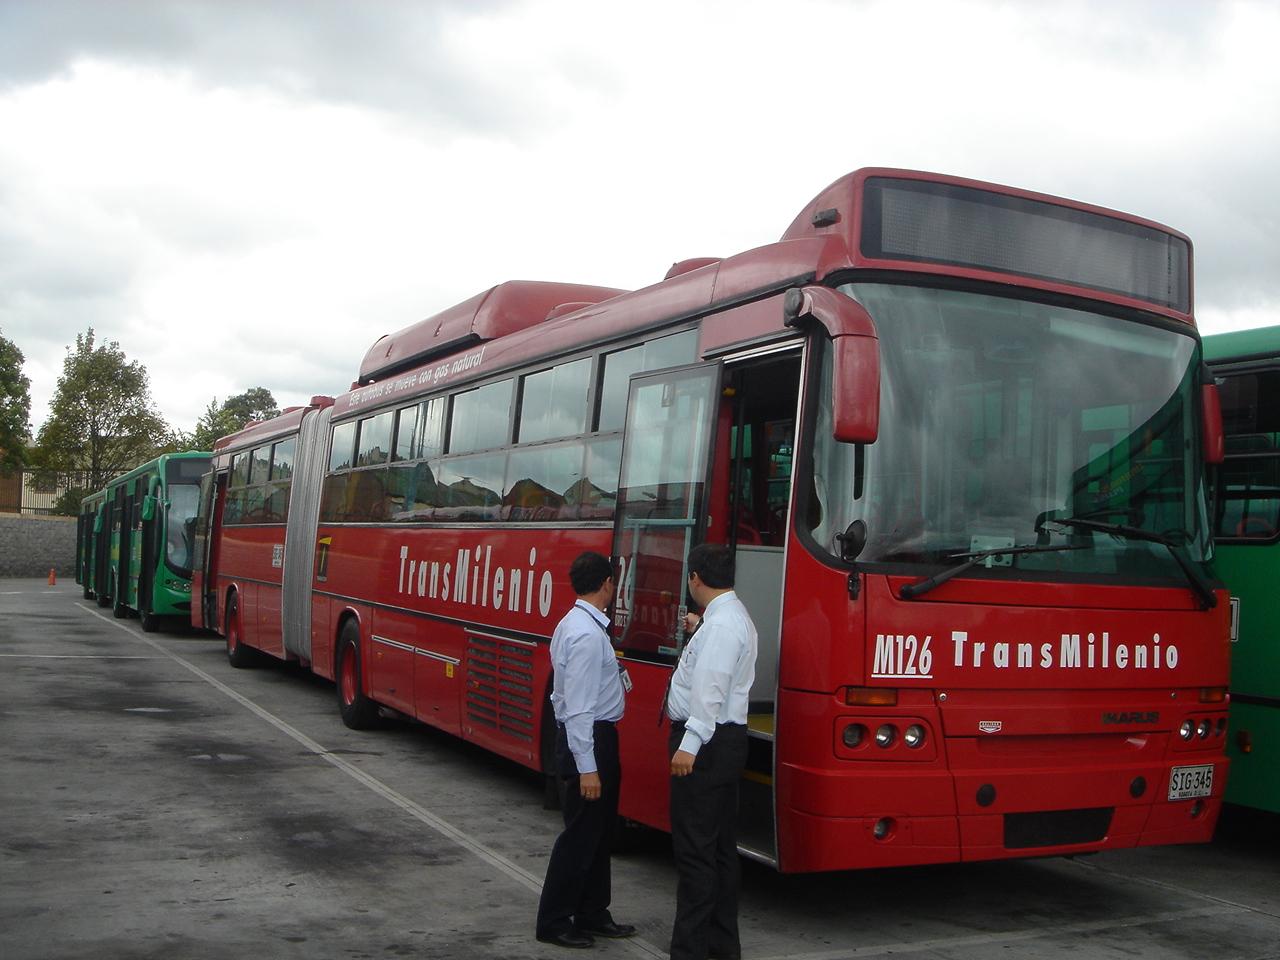 Ikarus De colombia buses de stm page 39 skyscrapercity